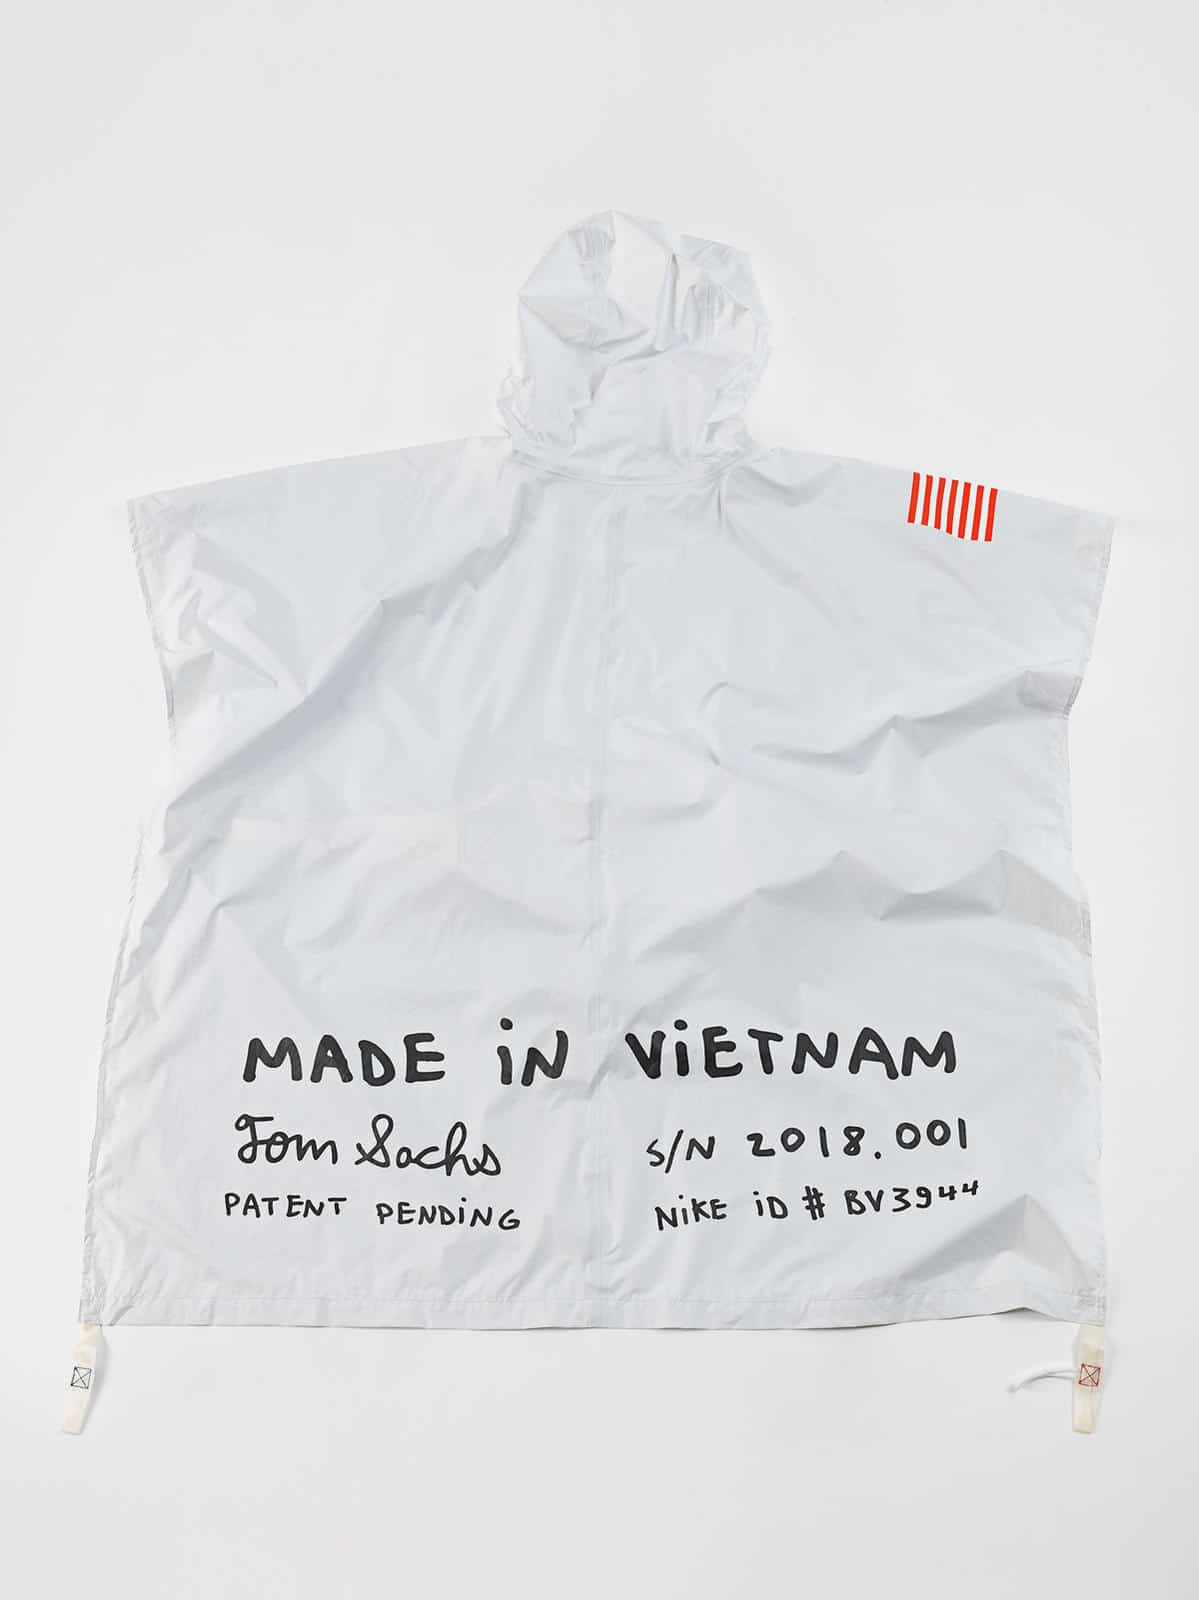 Сделано во Вьетнаме